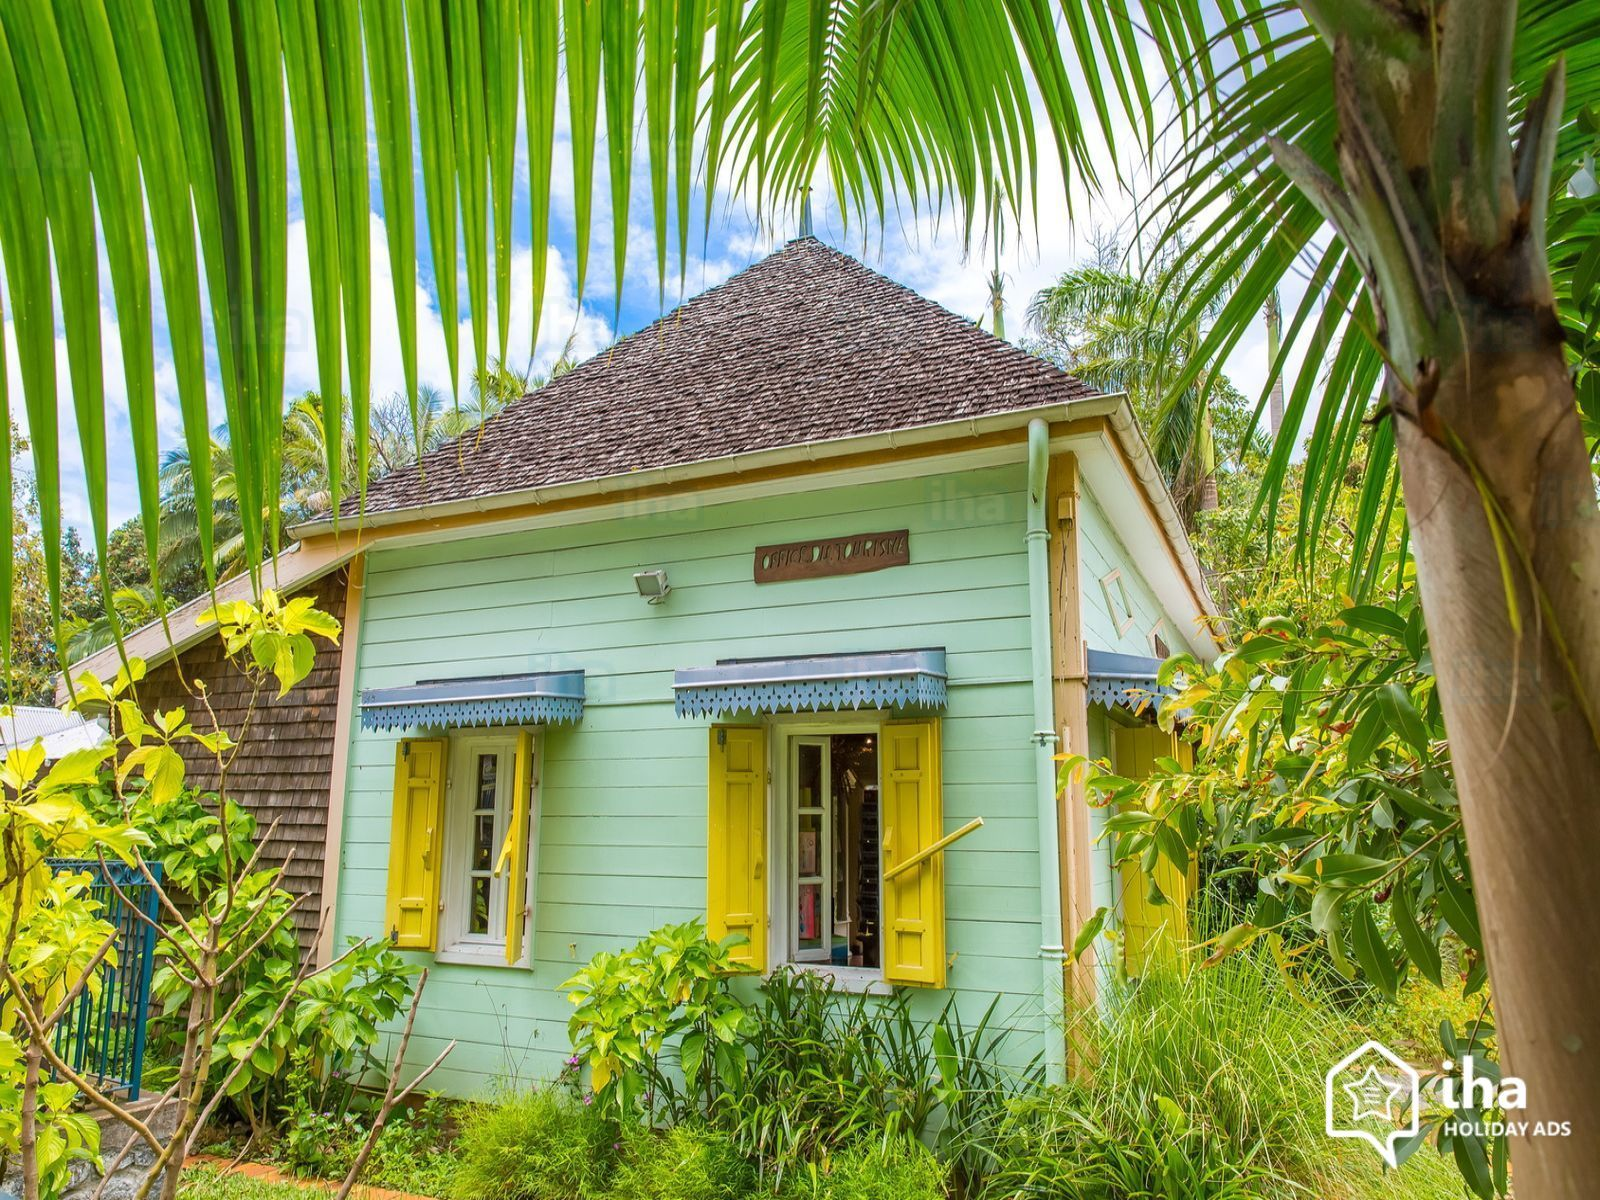 Plan dune maison creole for Plan maison creole traditionnelle